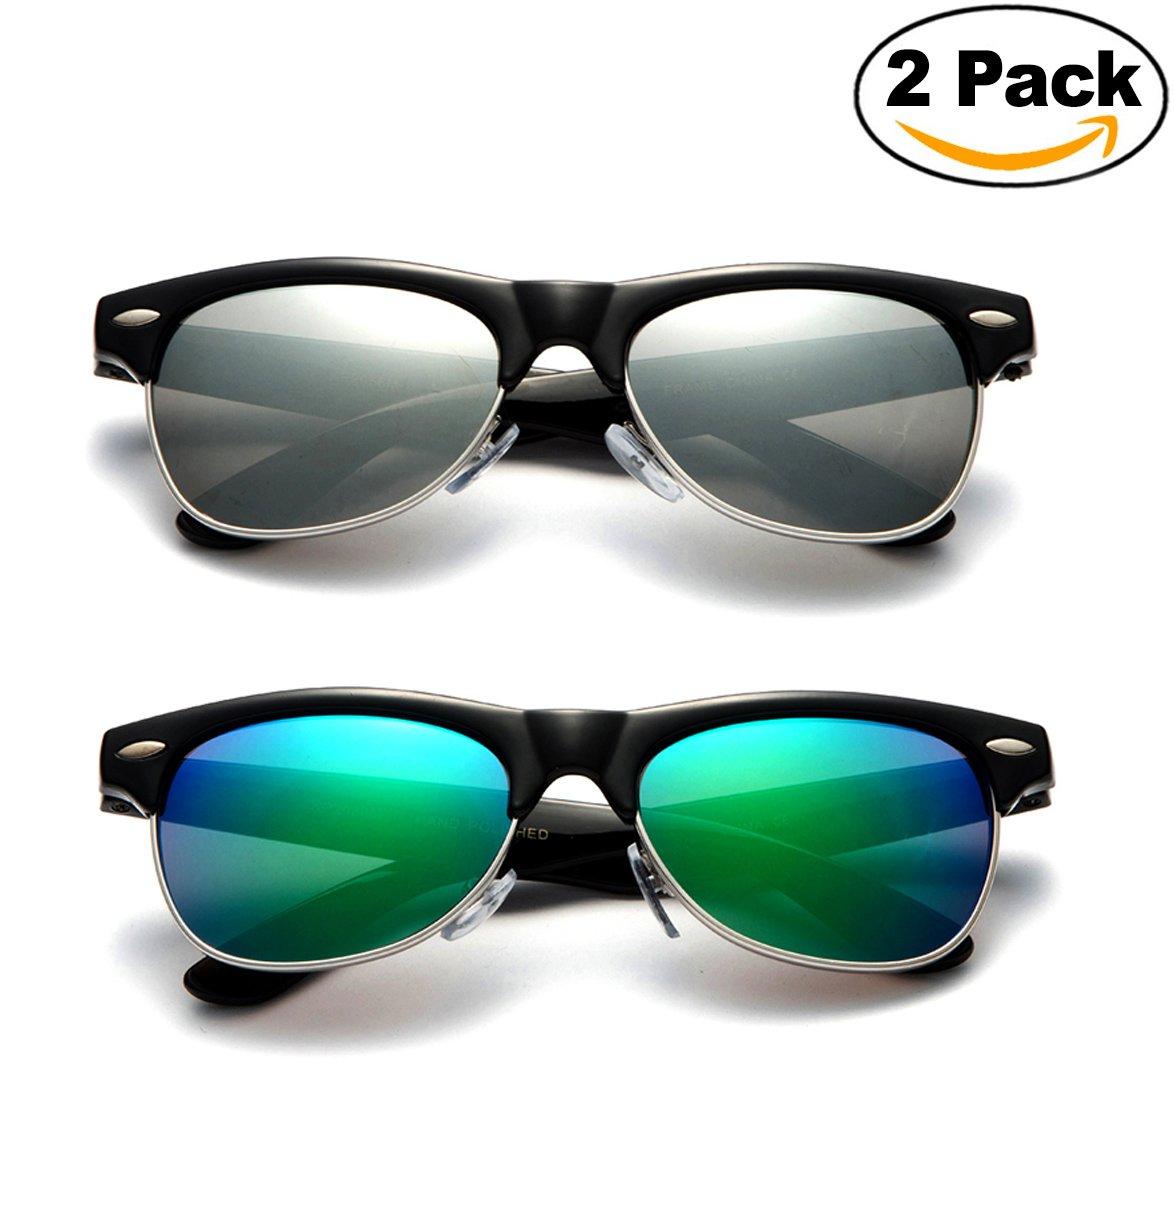 ''Hayden'' - Kids Mirror Flash Lens Fashion Sunglasses Classic Fashion Look Clubmaster Vintage Kids Sunglasses Girls Boys UV Protection Lead Free